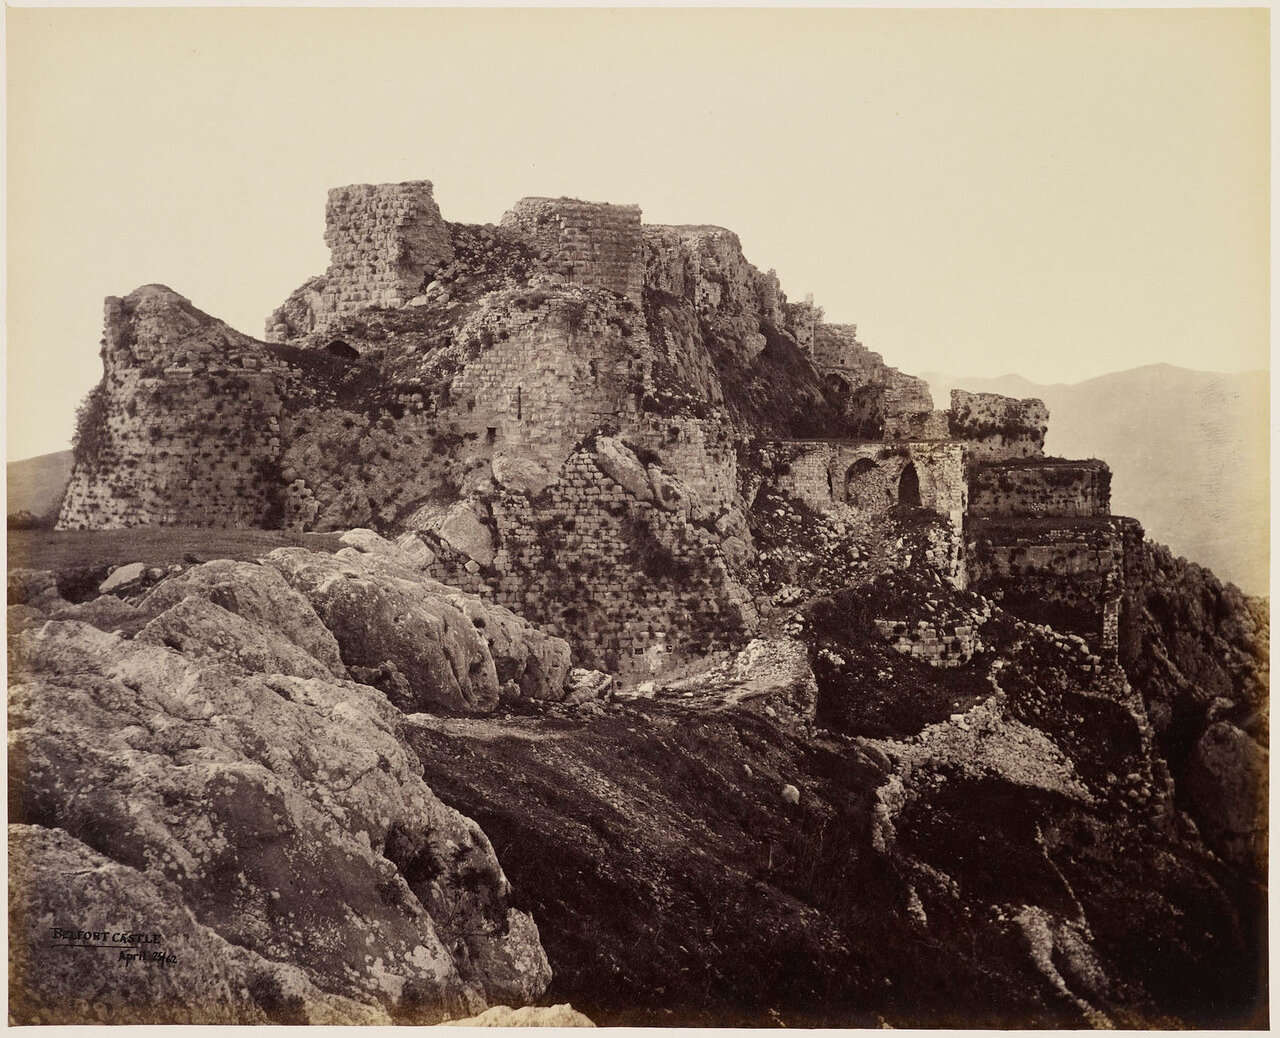 24 апреля 1862. Белфорт Замок, Ливан